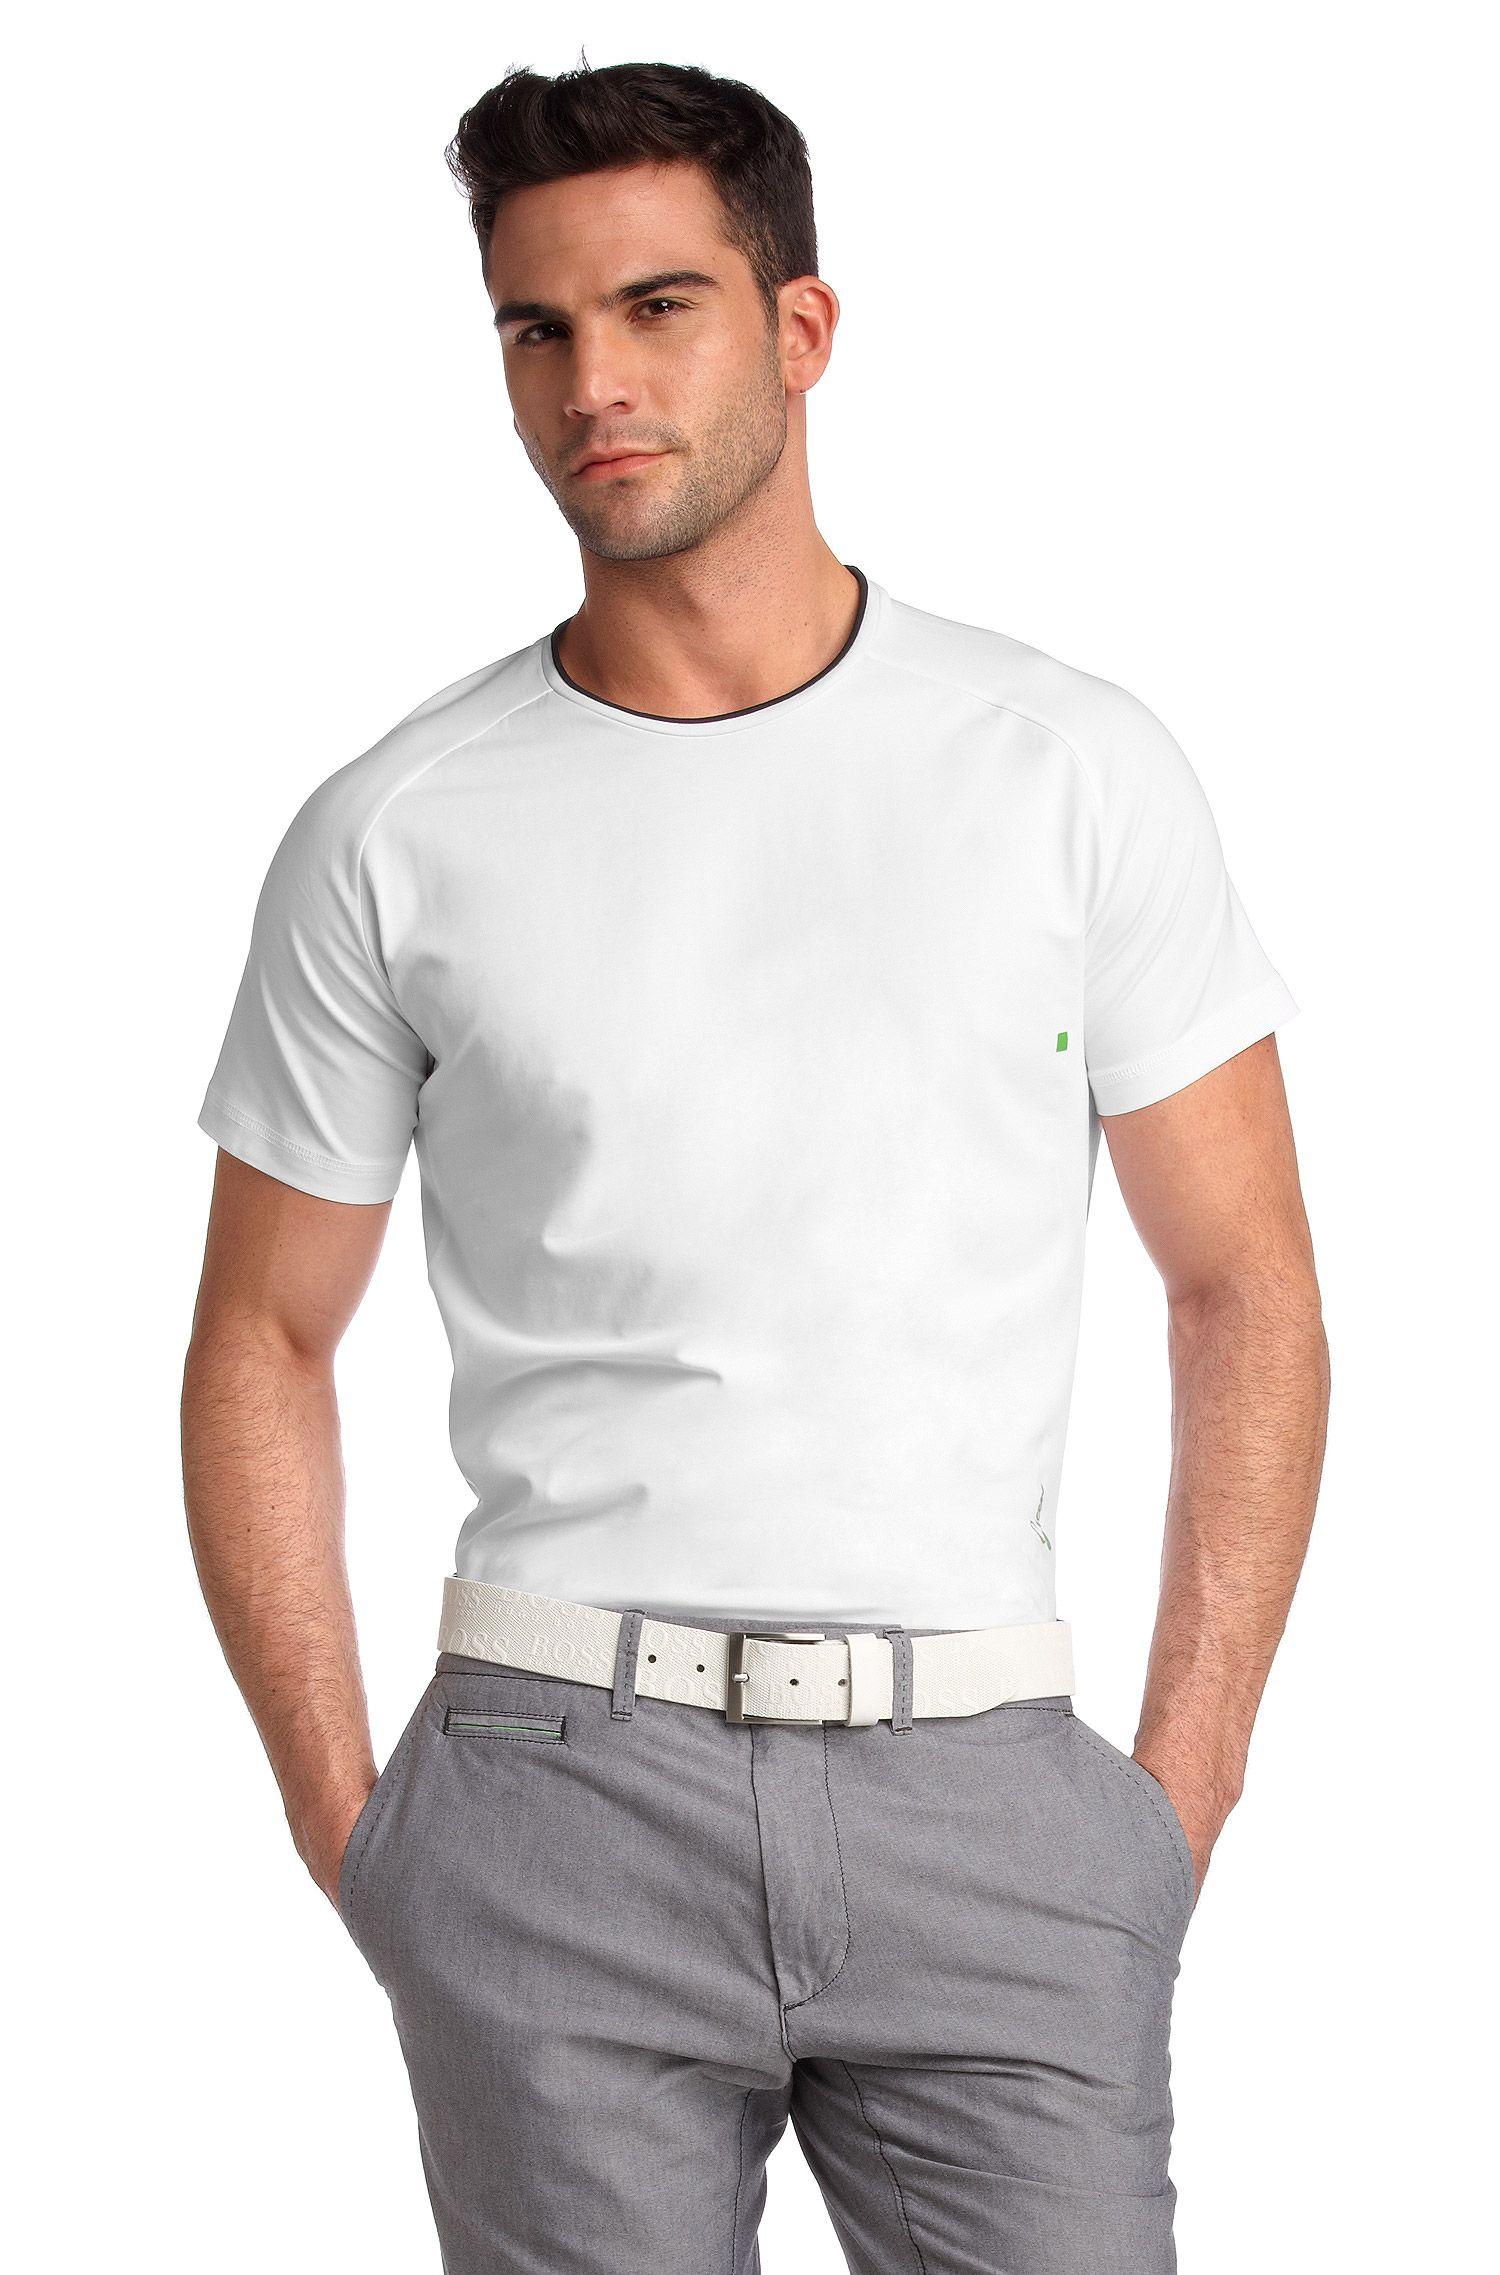 T-Shirt ´Tocho` mit besonders stylishem Ärmel